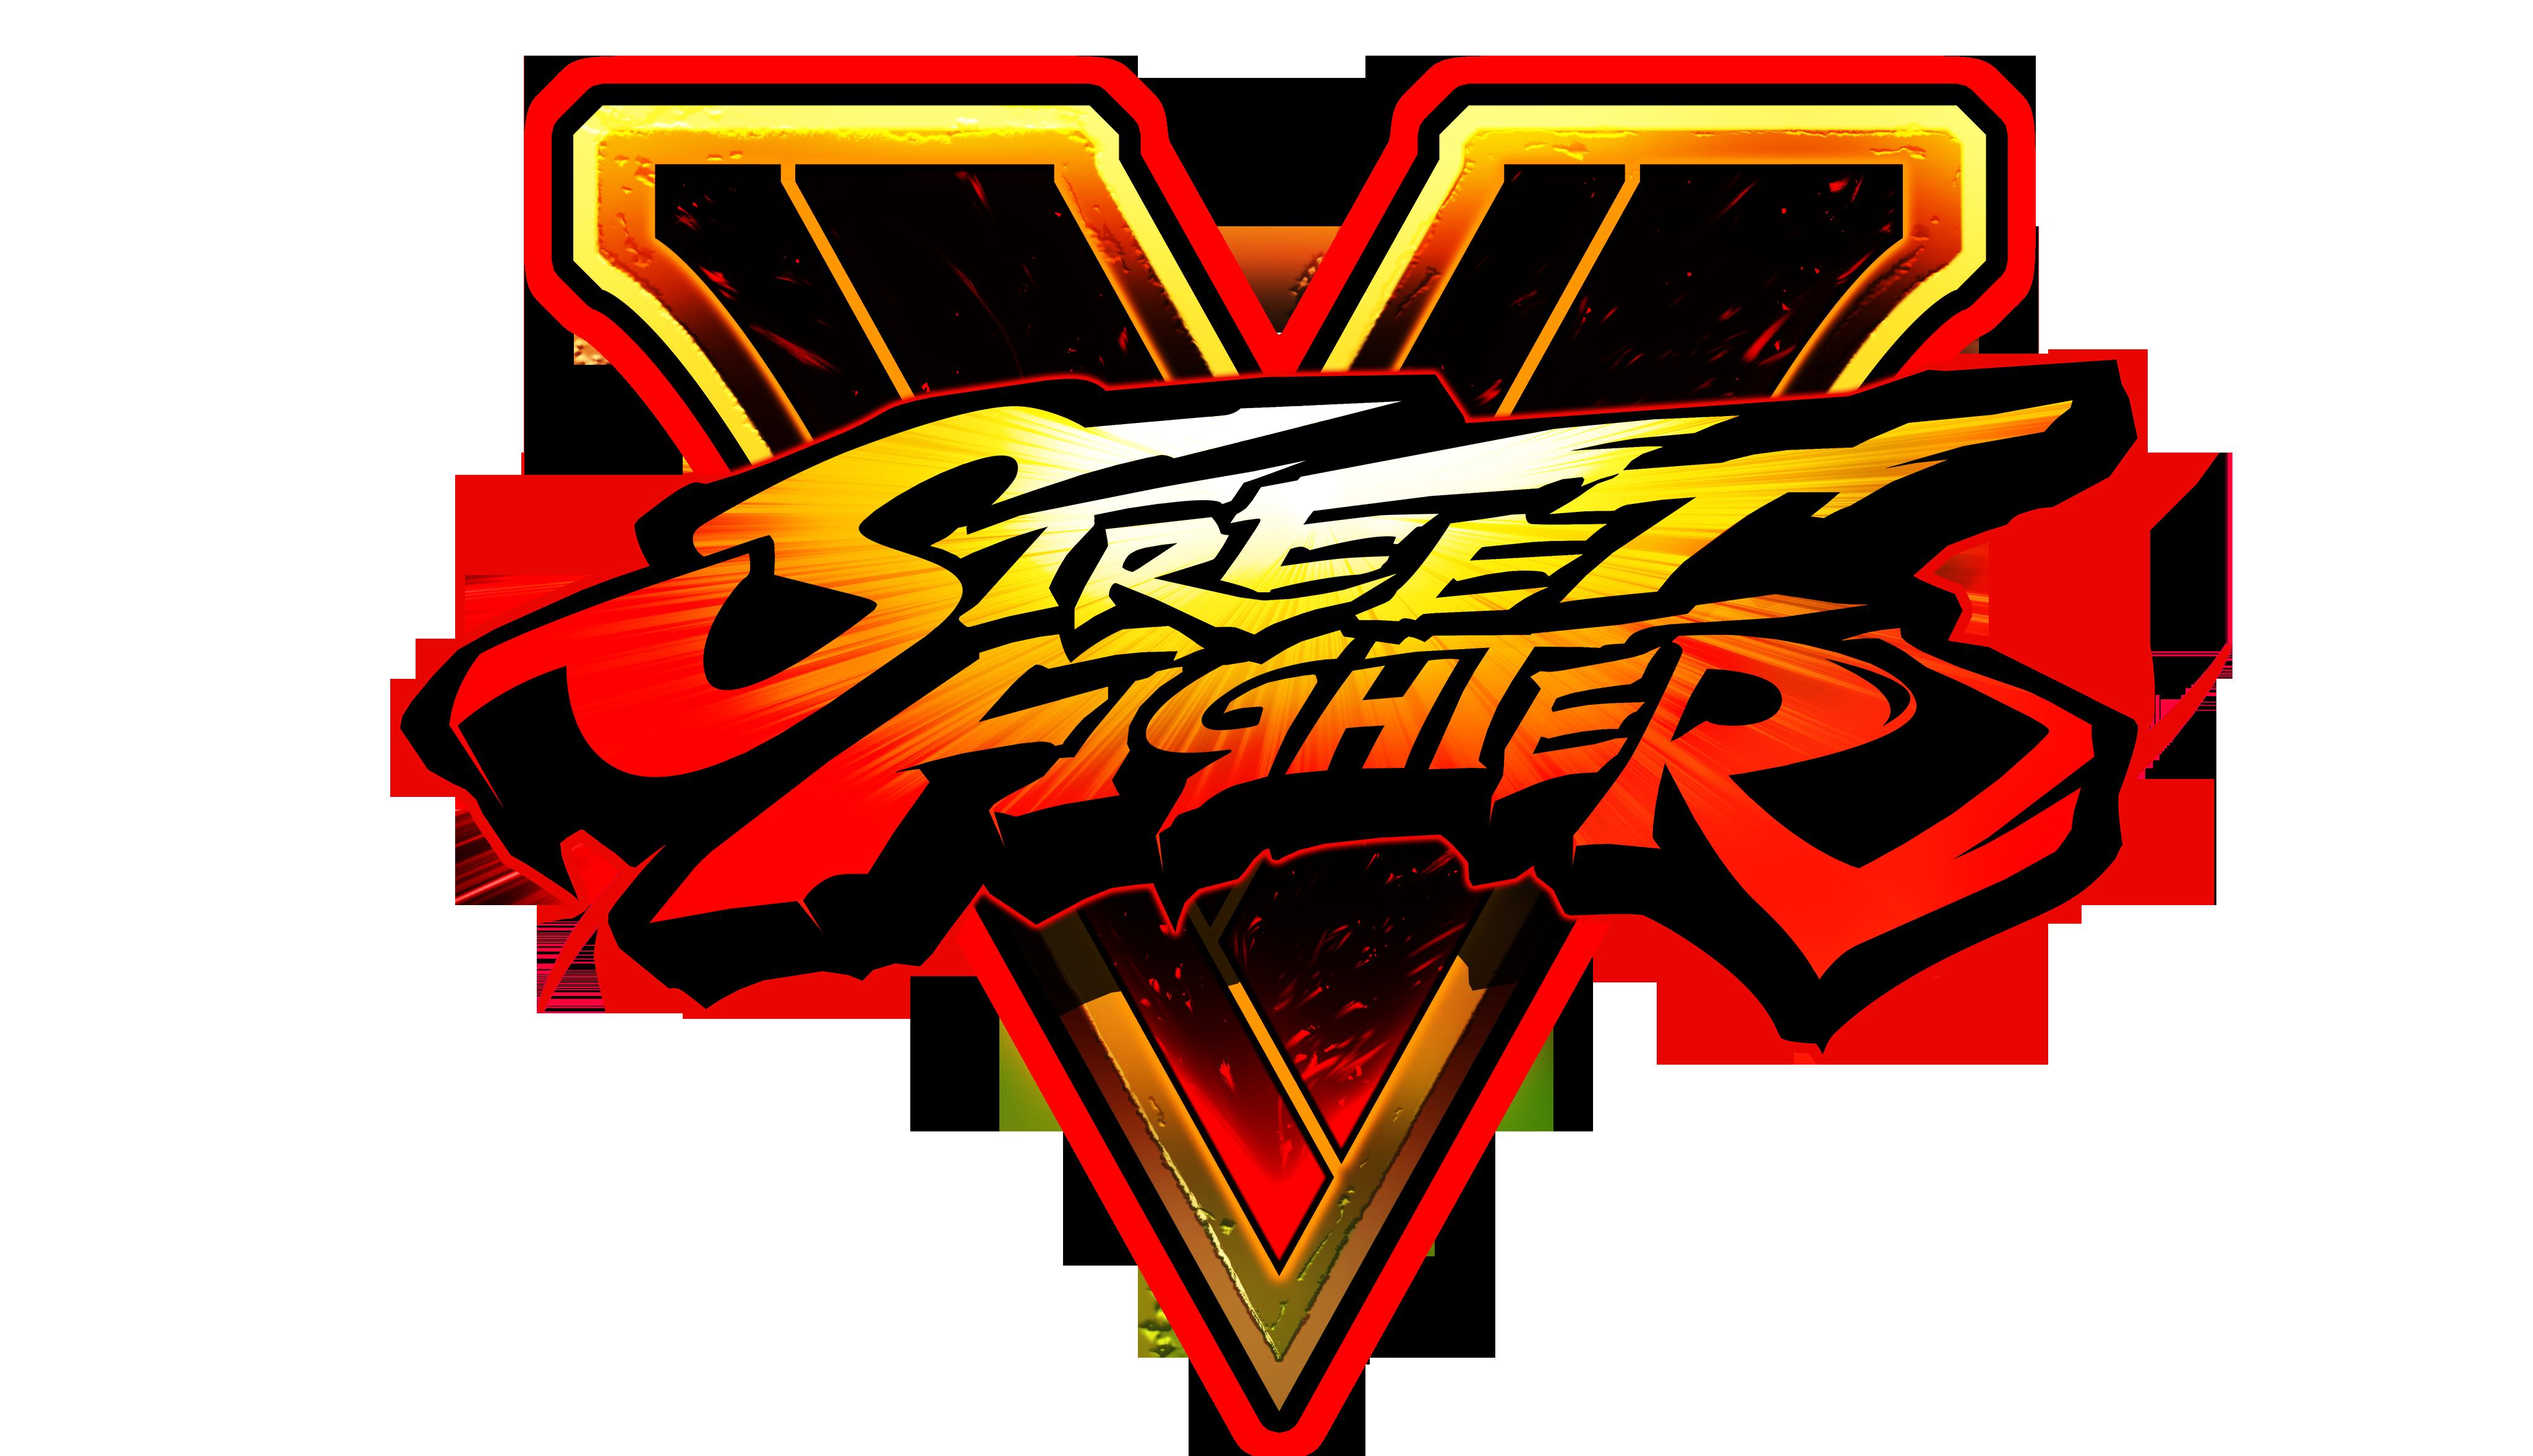 Street Fighter Logo Image Download Logo Logowiki Net